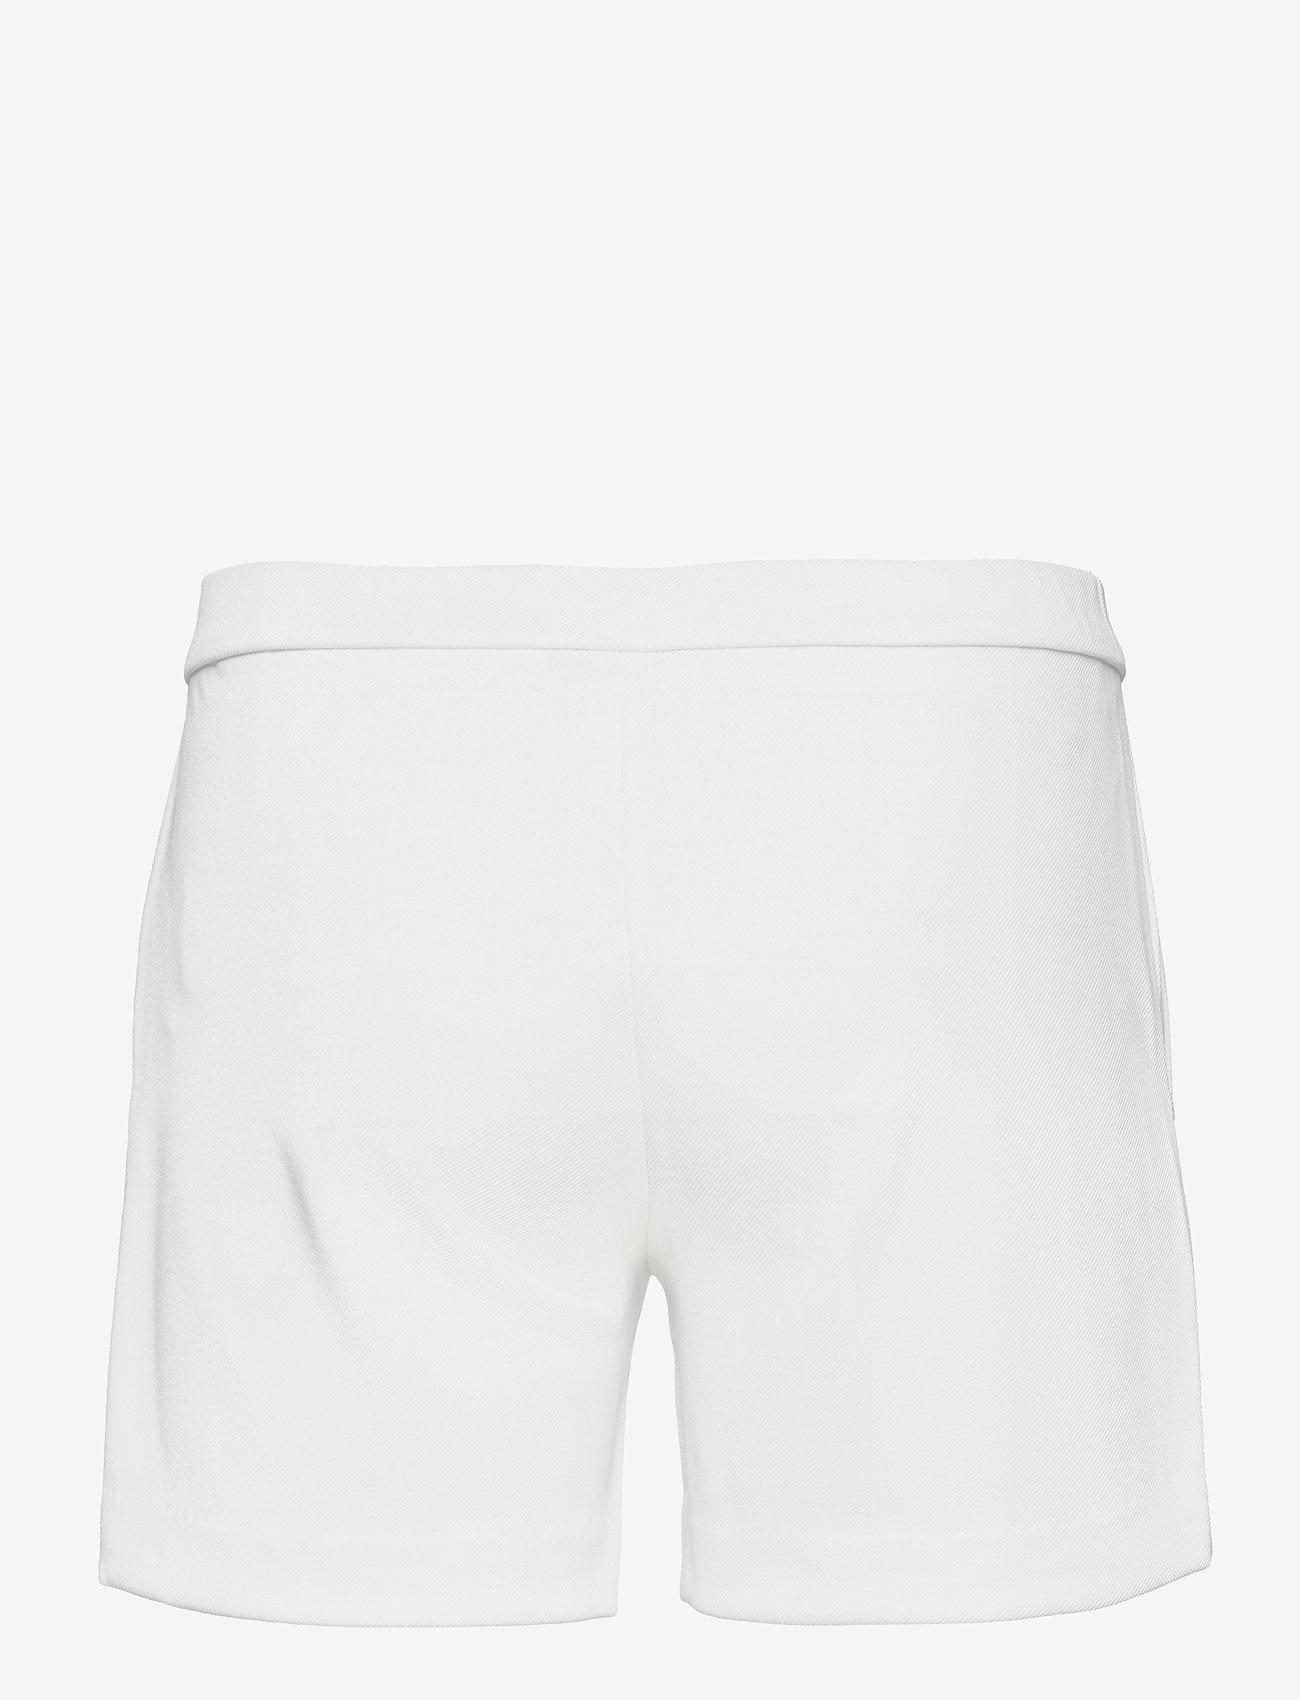 Ron Dorff - TENNIS SHORTS - training korte broek - white - 1